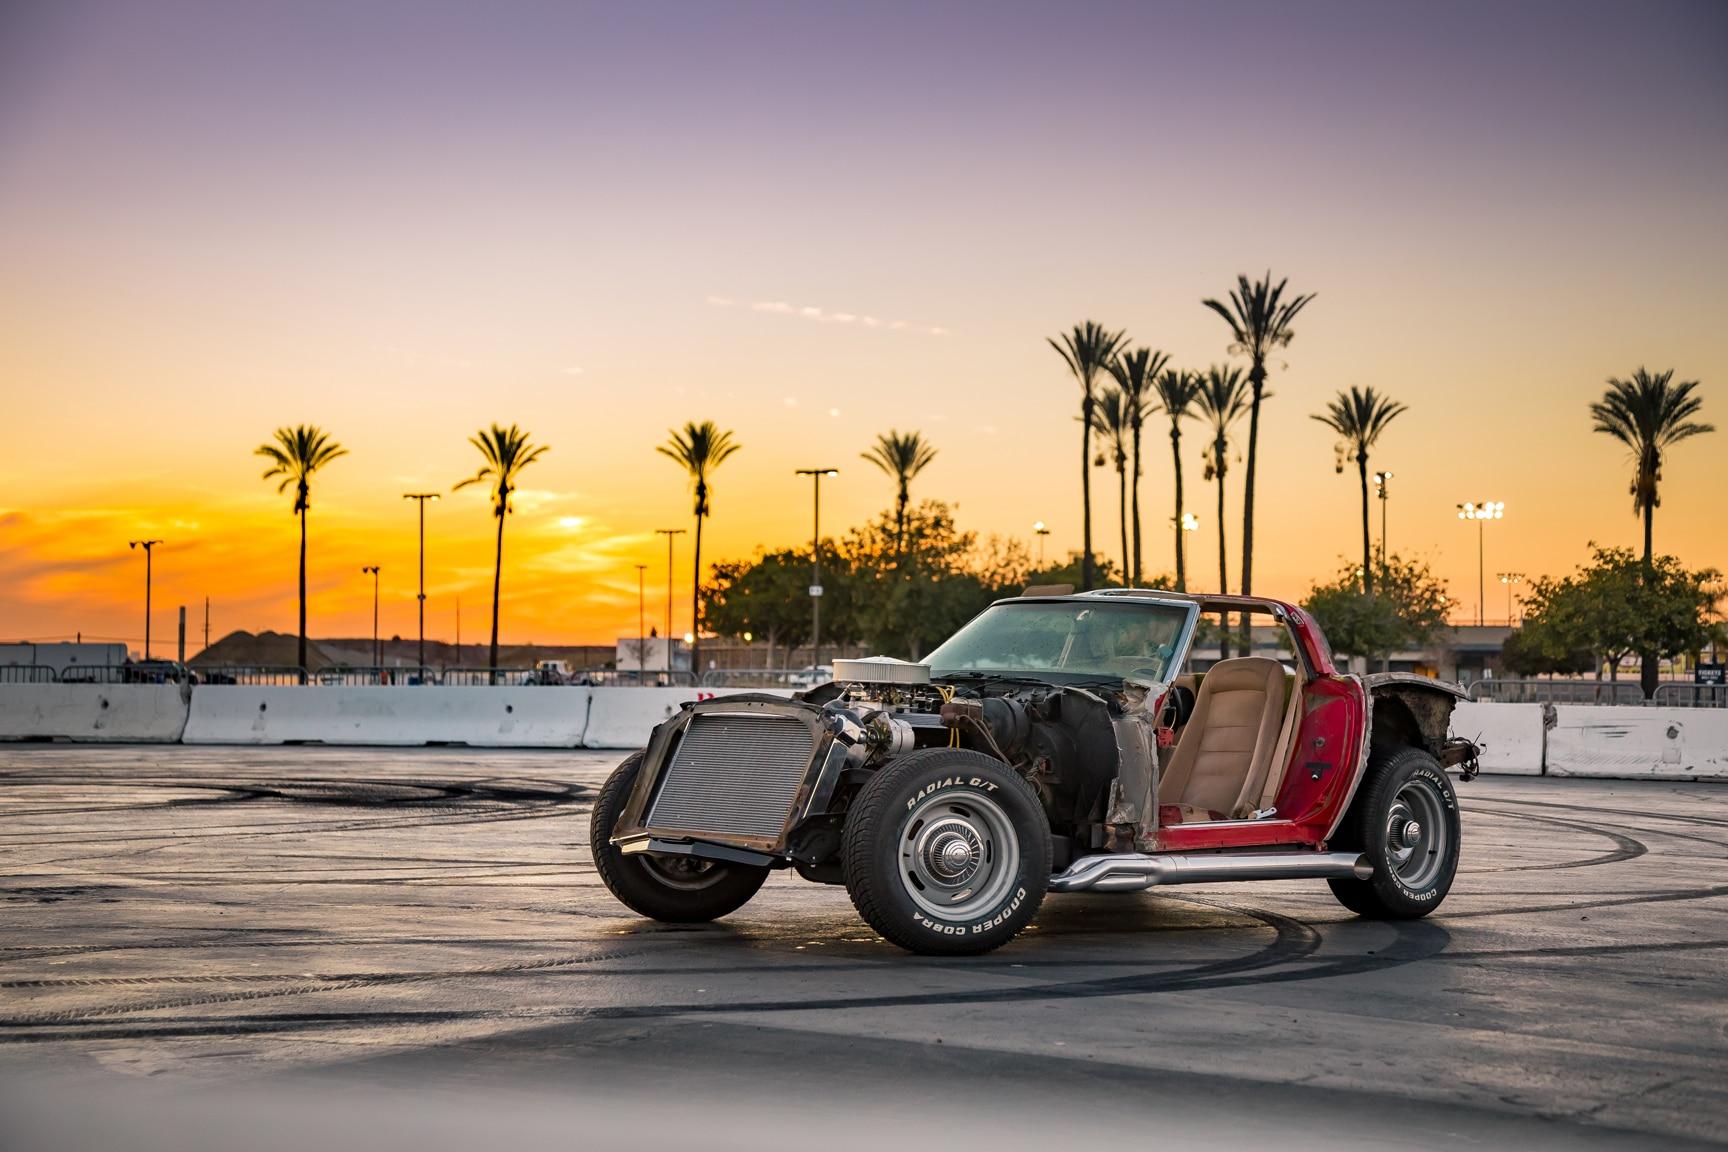 Hot Rod Garage: 1970s Street Machine Corvette